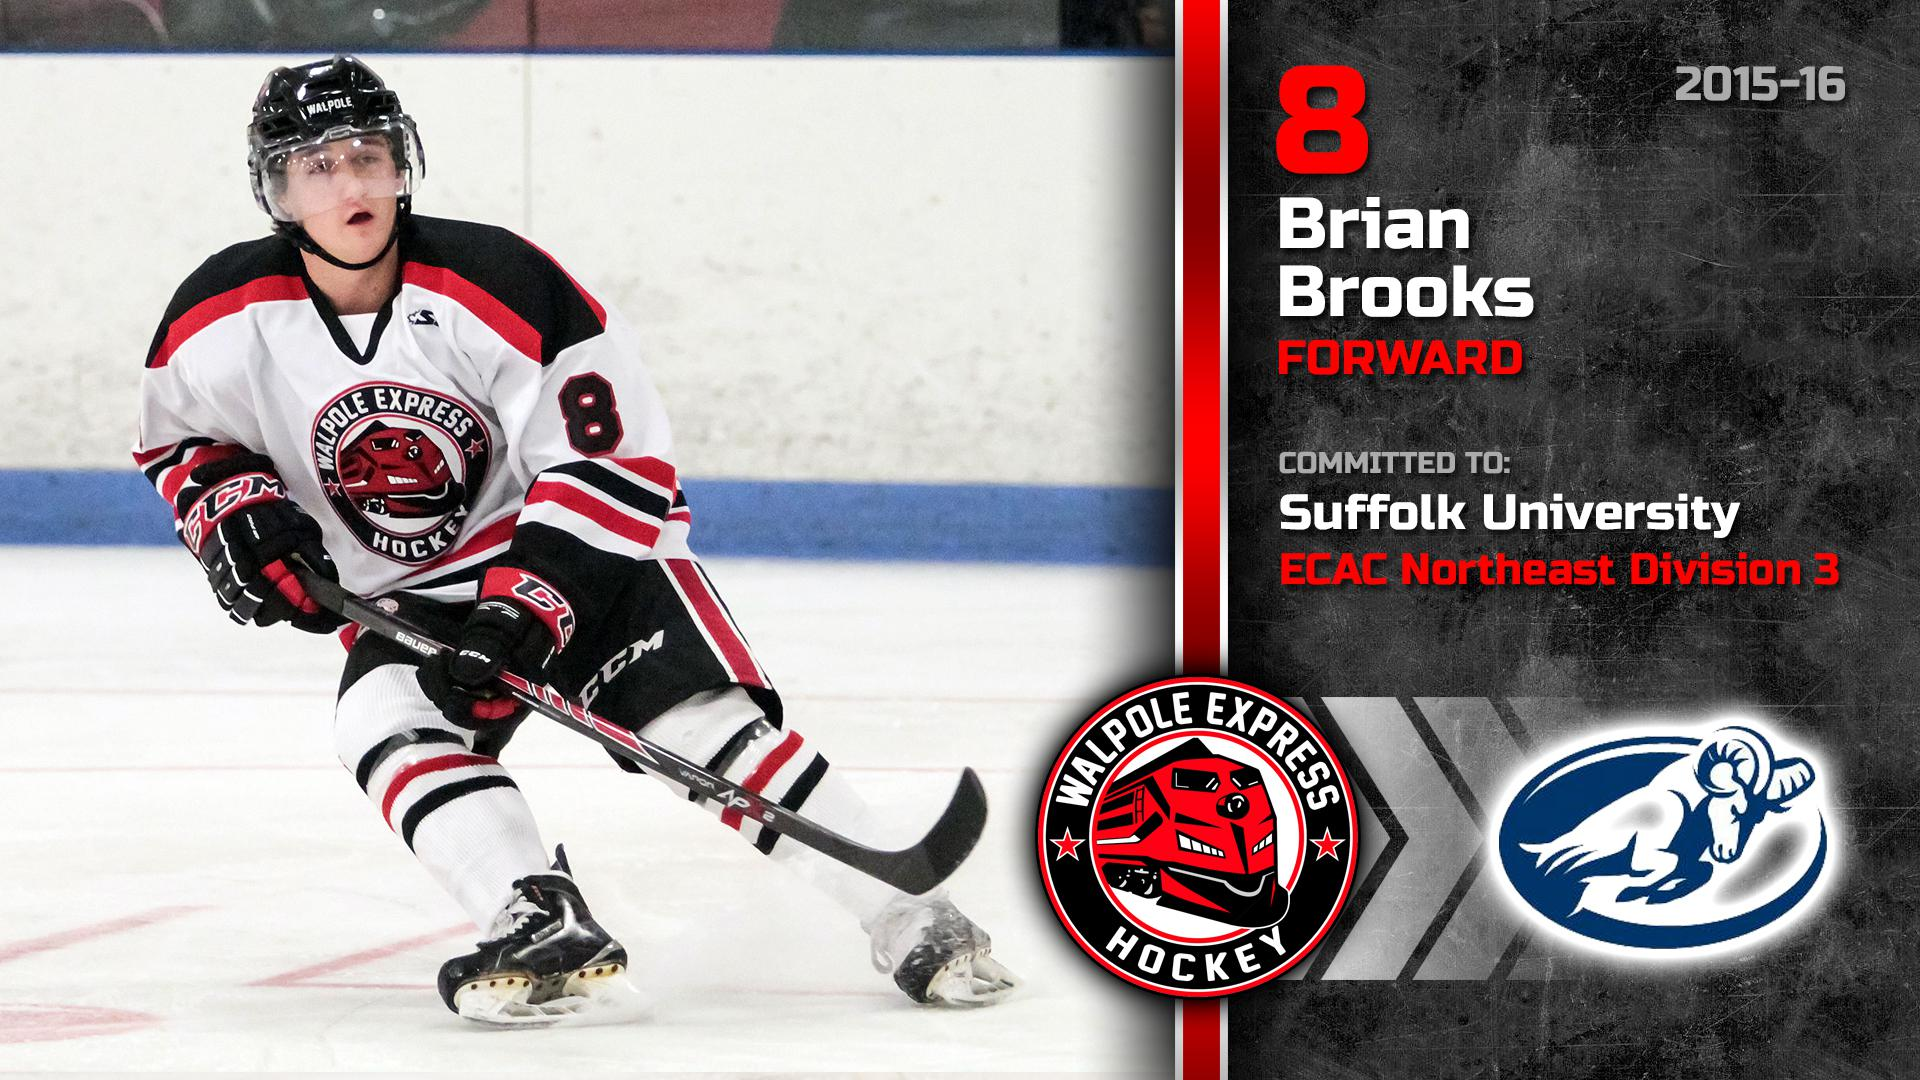 Brian Brooks